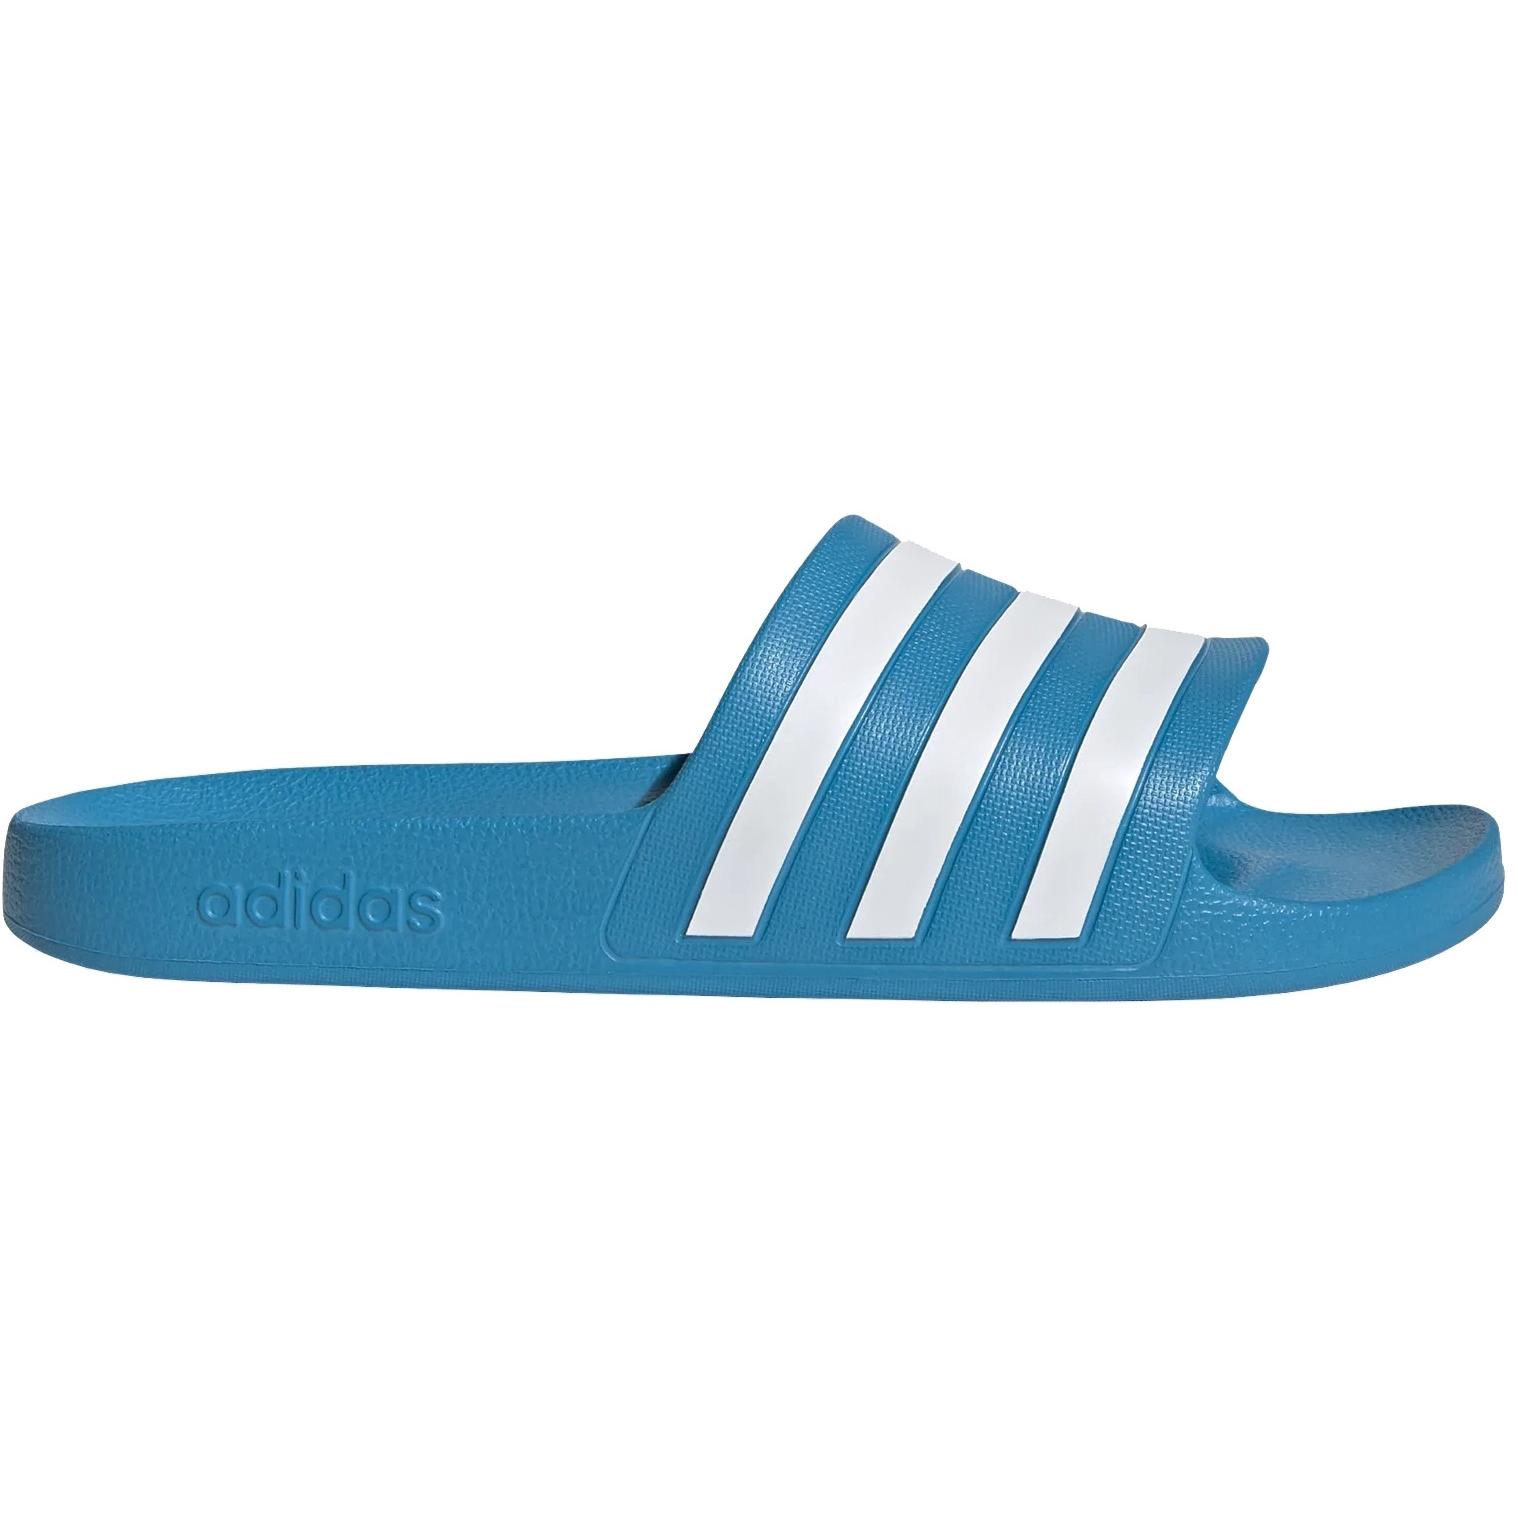 Produktbild von adidas Adilette Aqua Badeschuhe - solar blue/cloud white/solar blue FY8047